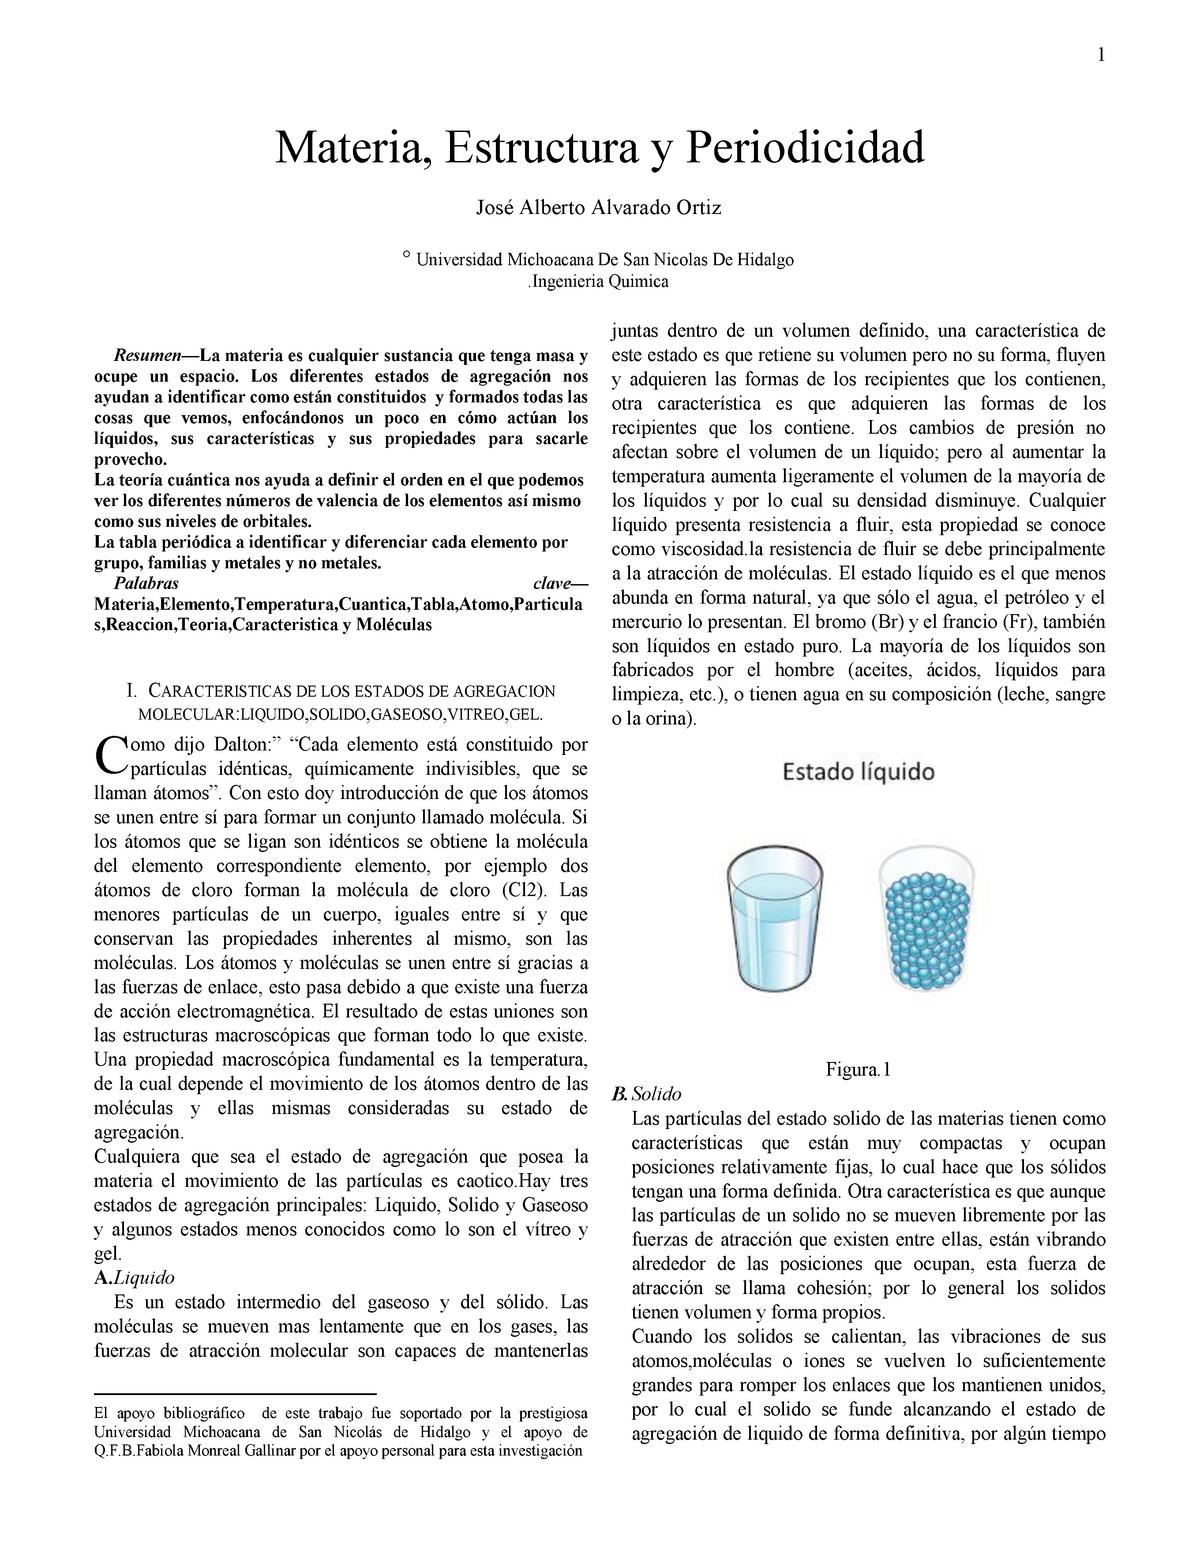 Materia Y Estructura Nota 8 9 Química Inorgánica Studocu